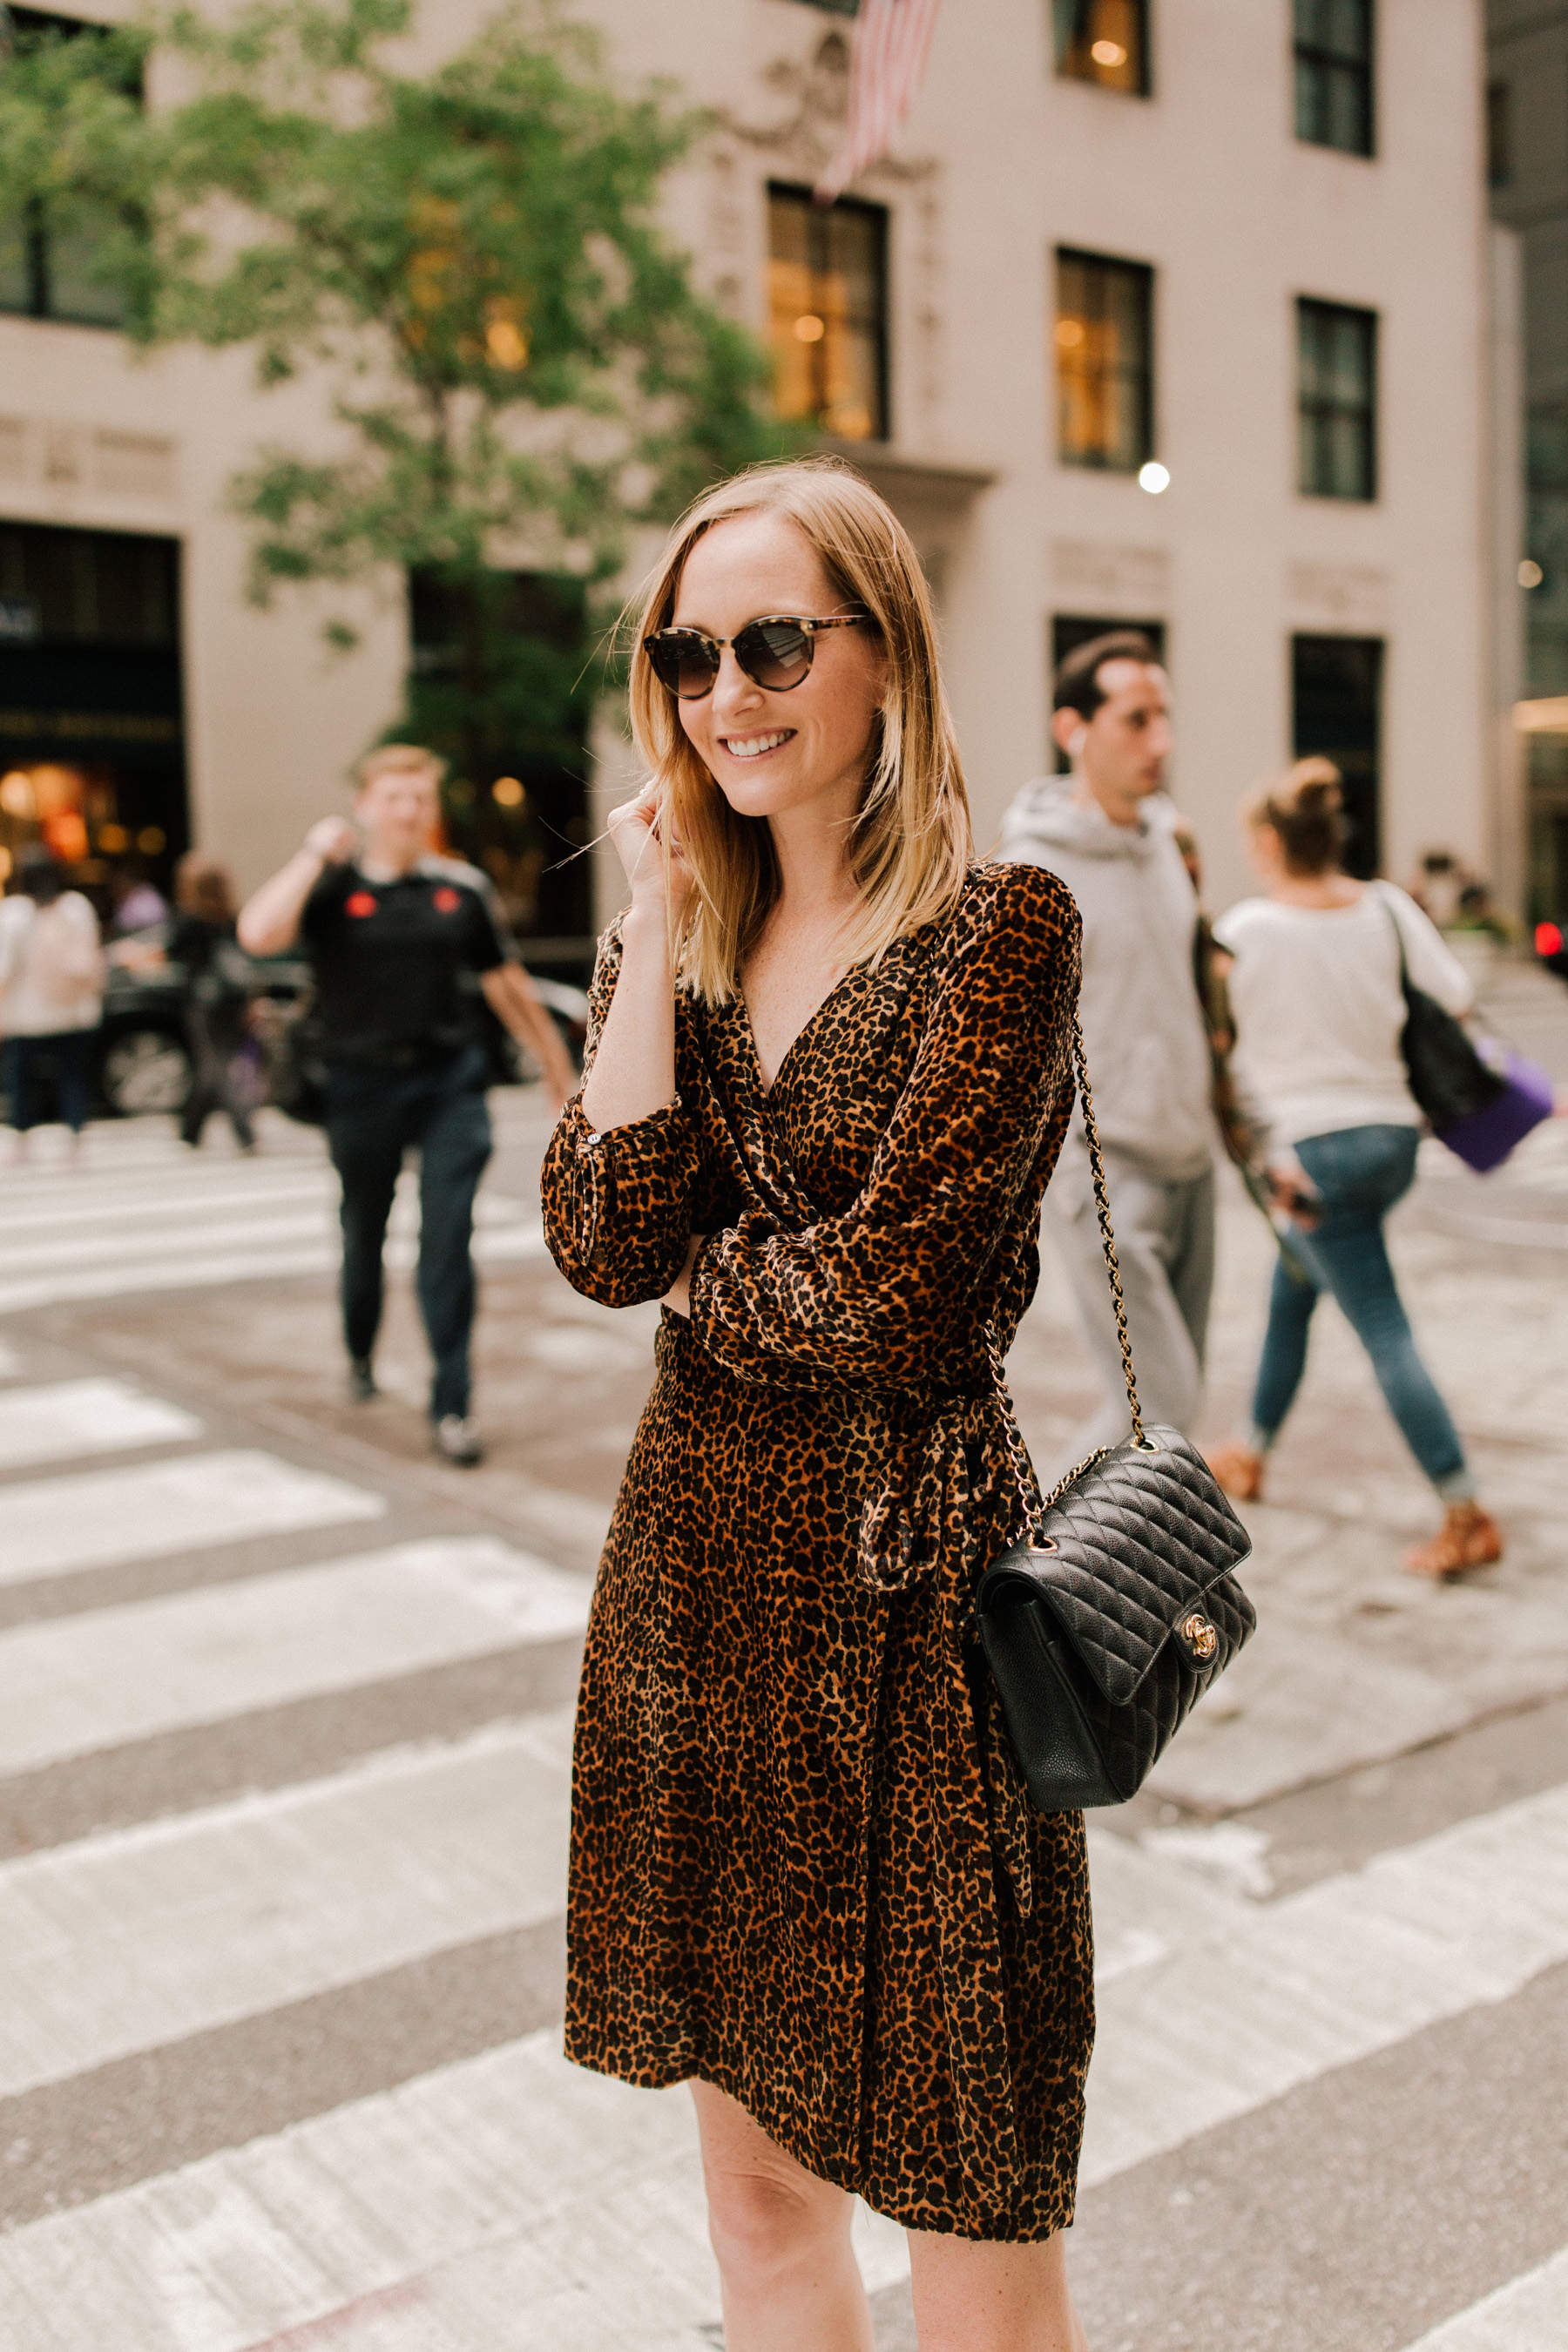 Velvet Leopard Wrap Dress - Kelly in the City